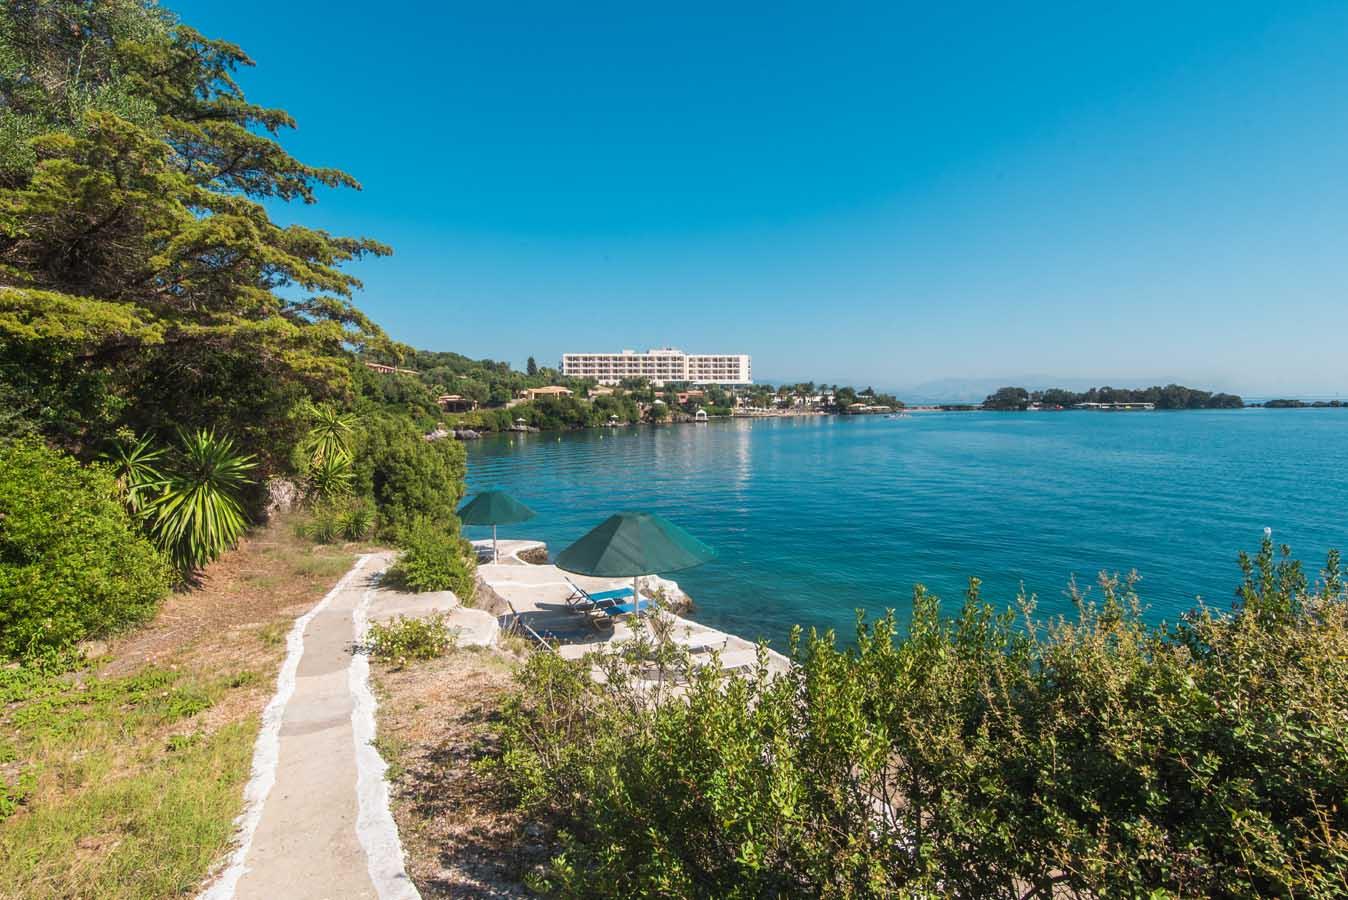 panoramic sea view apartments corfu, town view apartments in corfu, Ionian sea view apartments in Corfu, natural beauty apartments in corfu, Apartments Corfu, Accommodation in Corfu,panoramic view of corfu town, Κέρκυρα διαμερισματα δίπλα στη θάλασσα, διαμερισματα Κέρκυρα κοντά στην πόλη, διαμερισματα Κέρκυρα κοντά στη χώρα, διαμερισματα με θέα την πόλη Κέρκυρα, διαμερισματα με θέα τη θάλασσα Κέρκυρα, διαμερισματα με θέα το Ιόνιο Κέρκυρα, διαμερισματα στην παραλία Κομμένο Κέρκυρα, Διαμερισματα Κερκυρα, Διαμονή Κέρκυρα